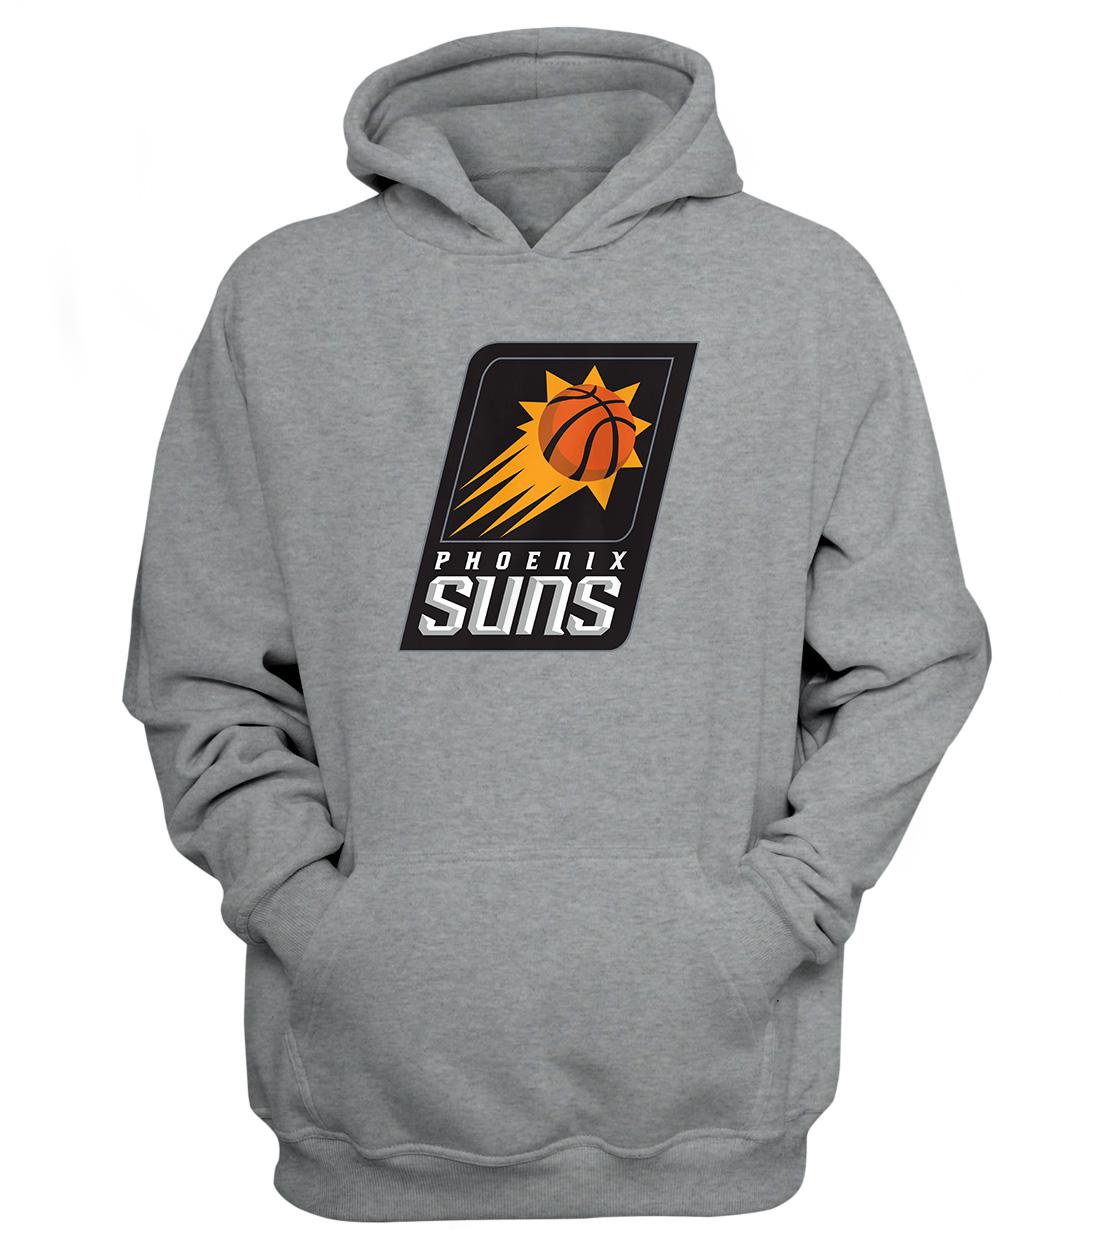 Phoenix Suns Hoodie (HD-GRY-NP-187-NBA-PHO-LOGO)